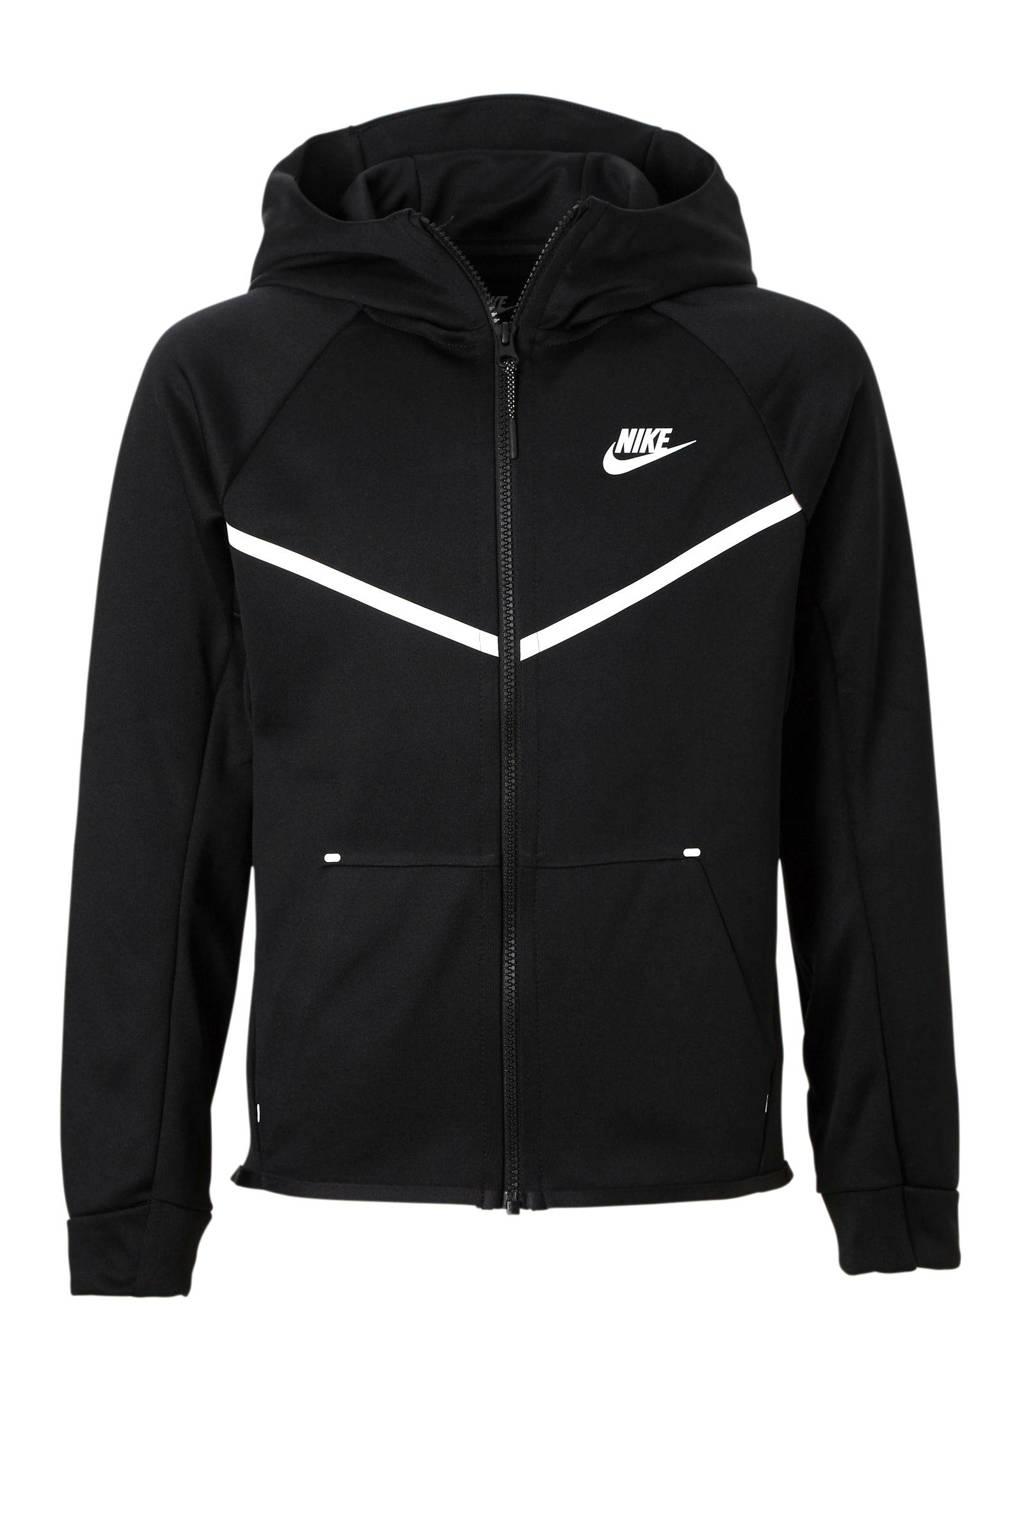 Nike vest zwart, Zwart